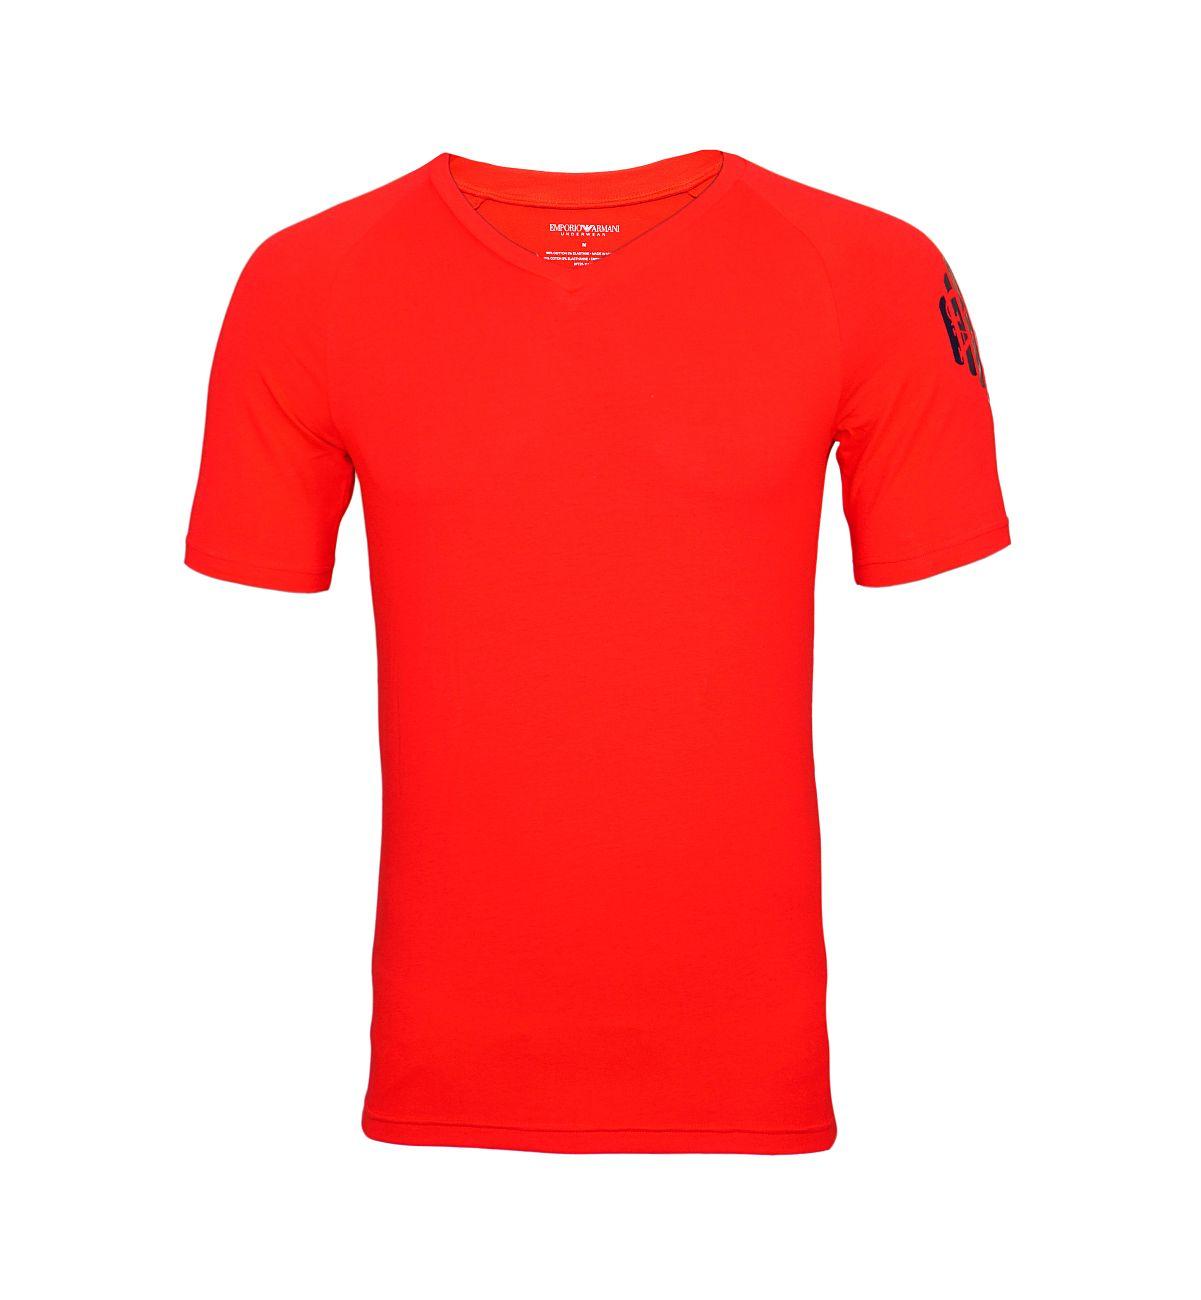 Emporio Armani T-Shirt V-Ausschnitt 111760 8P725 17574 TANGO RED F18-EAT1